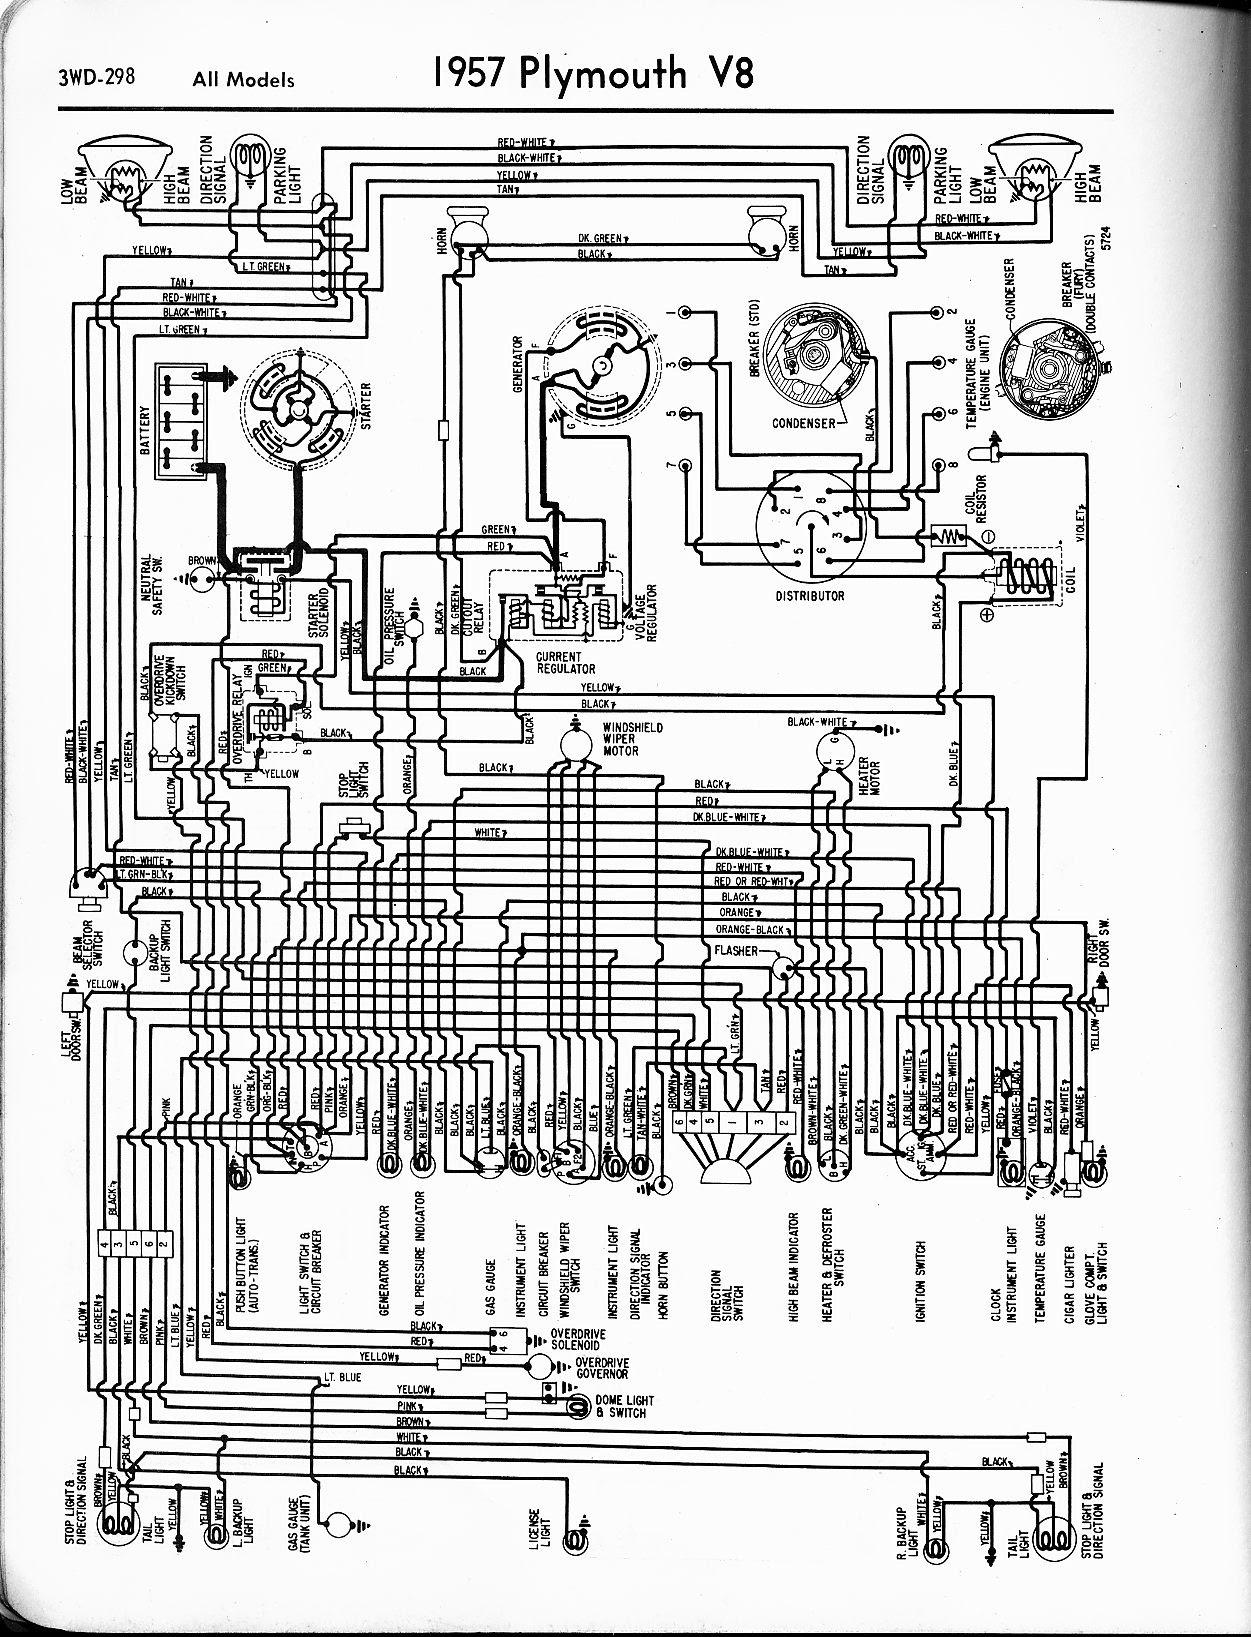 34 S10 Wiper Motor Wiring Diagram